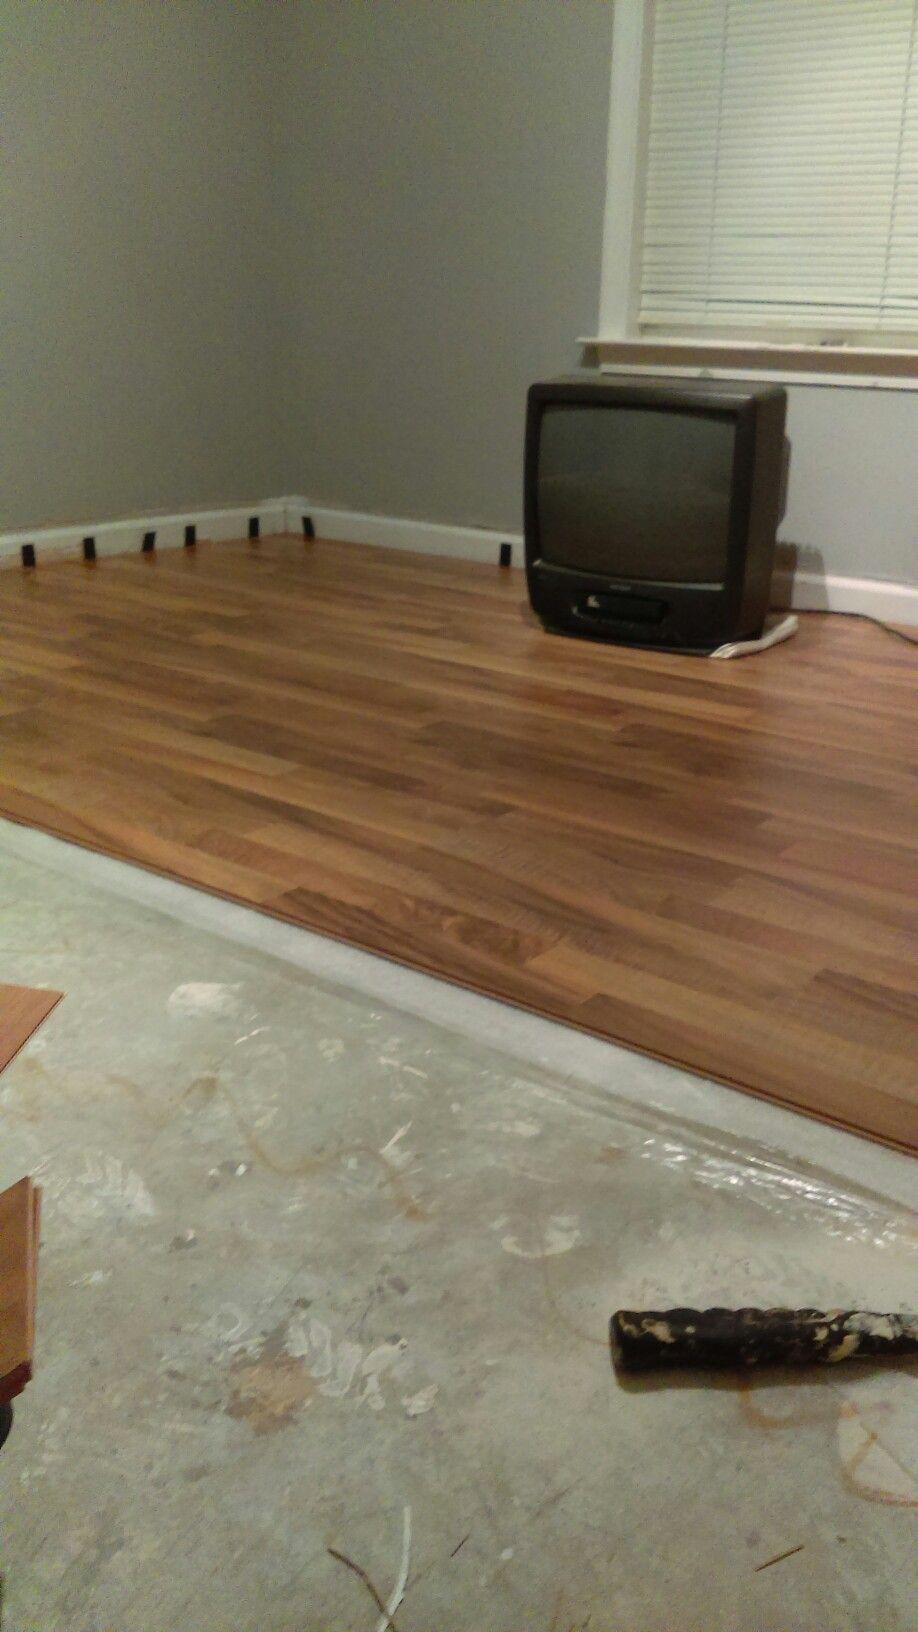 Paper flooring image by San705 on Third Bedroom Hardwood